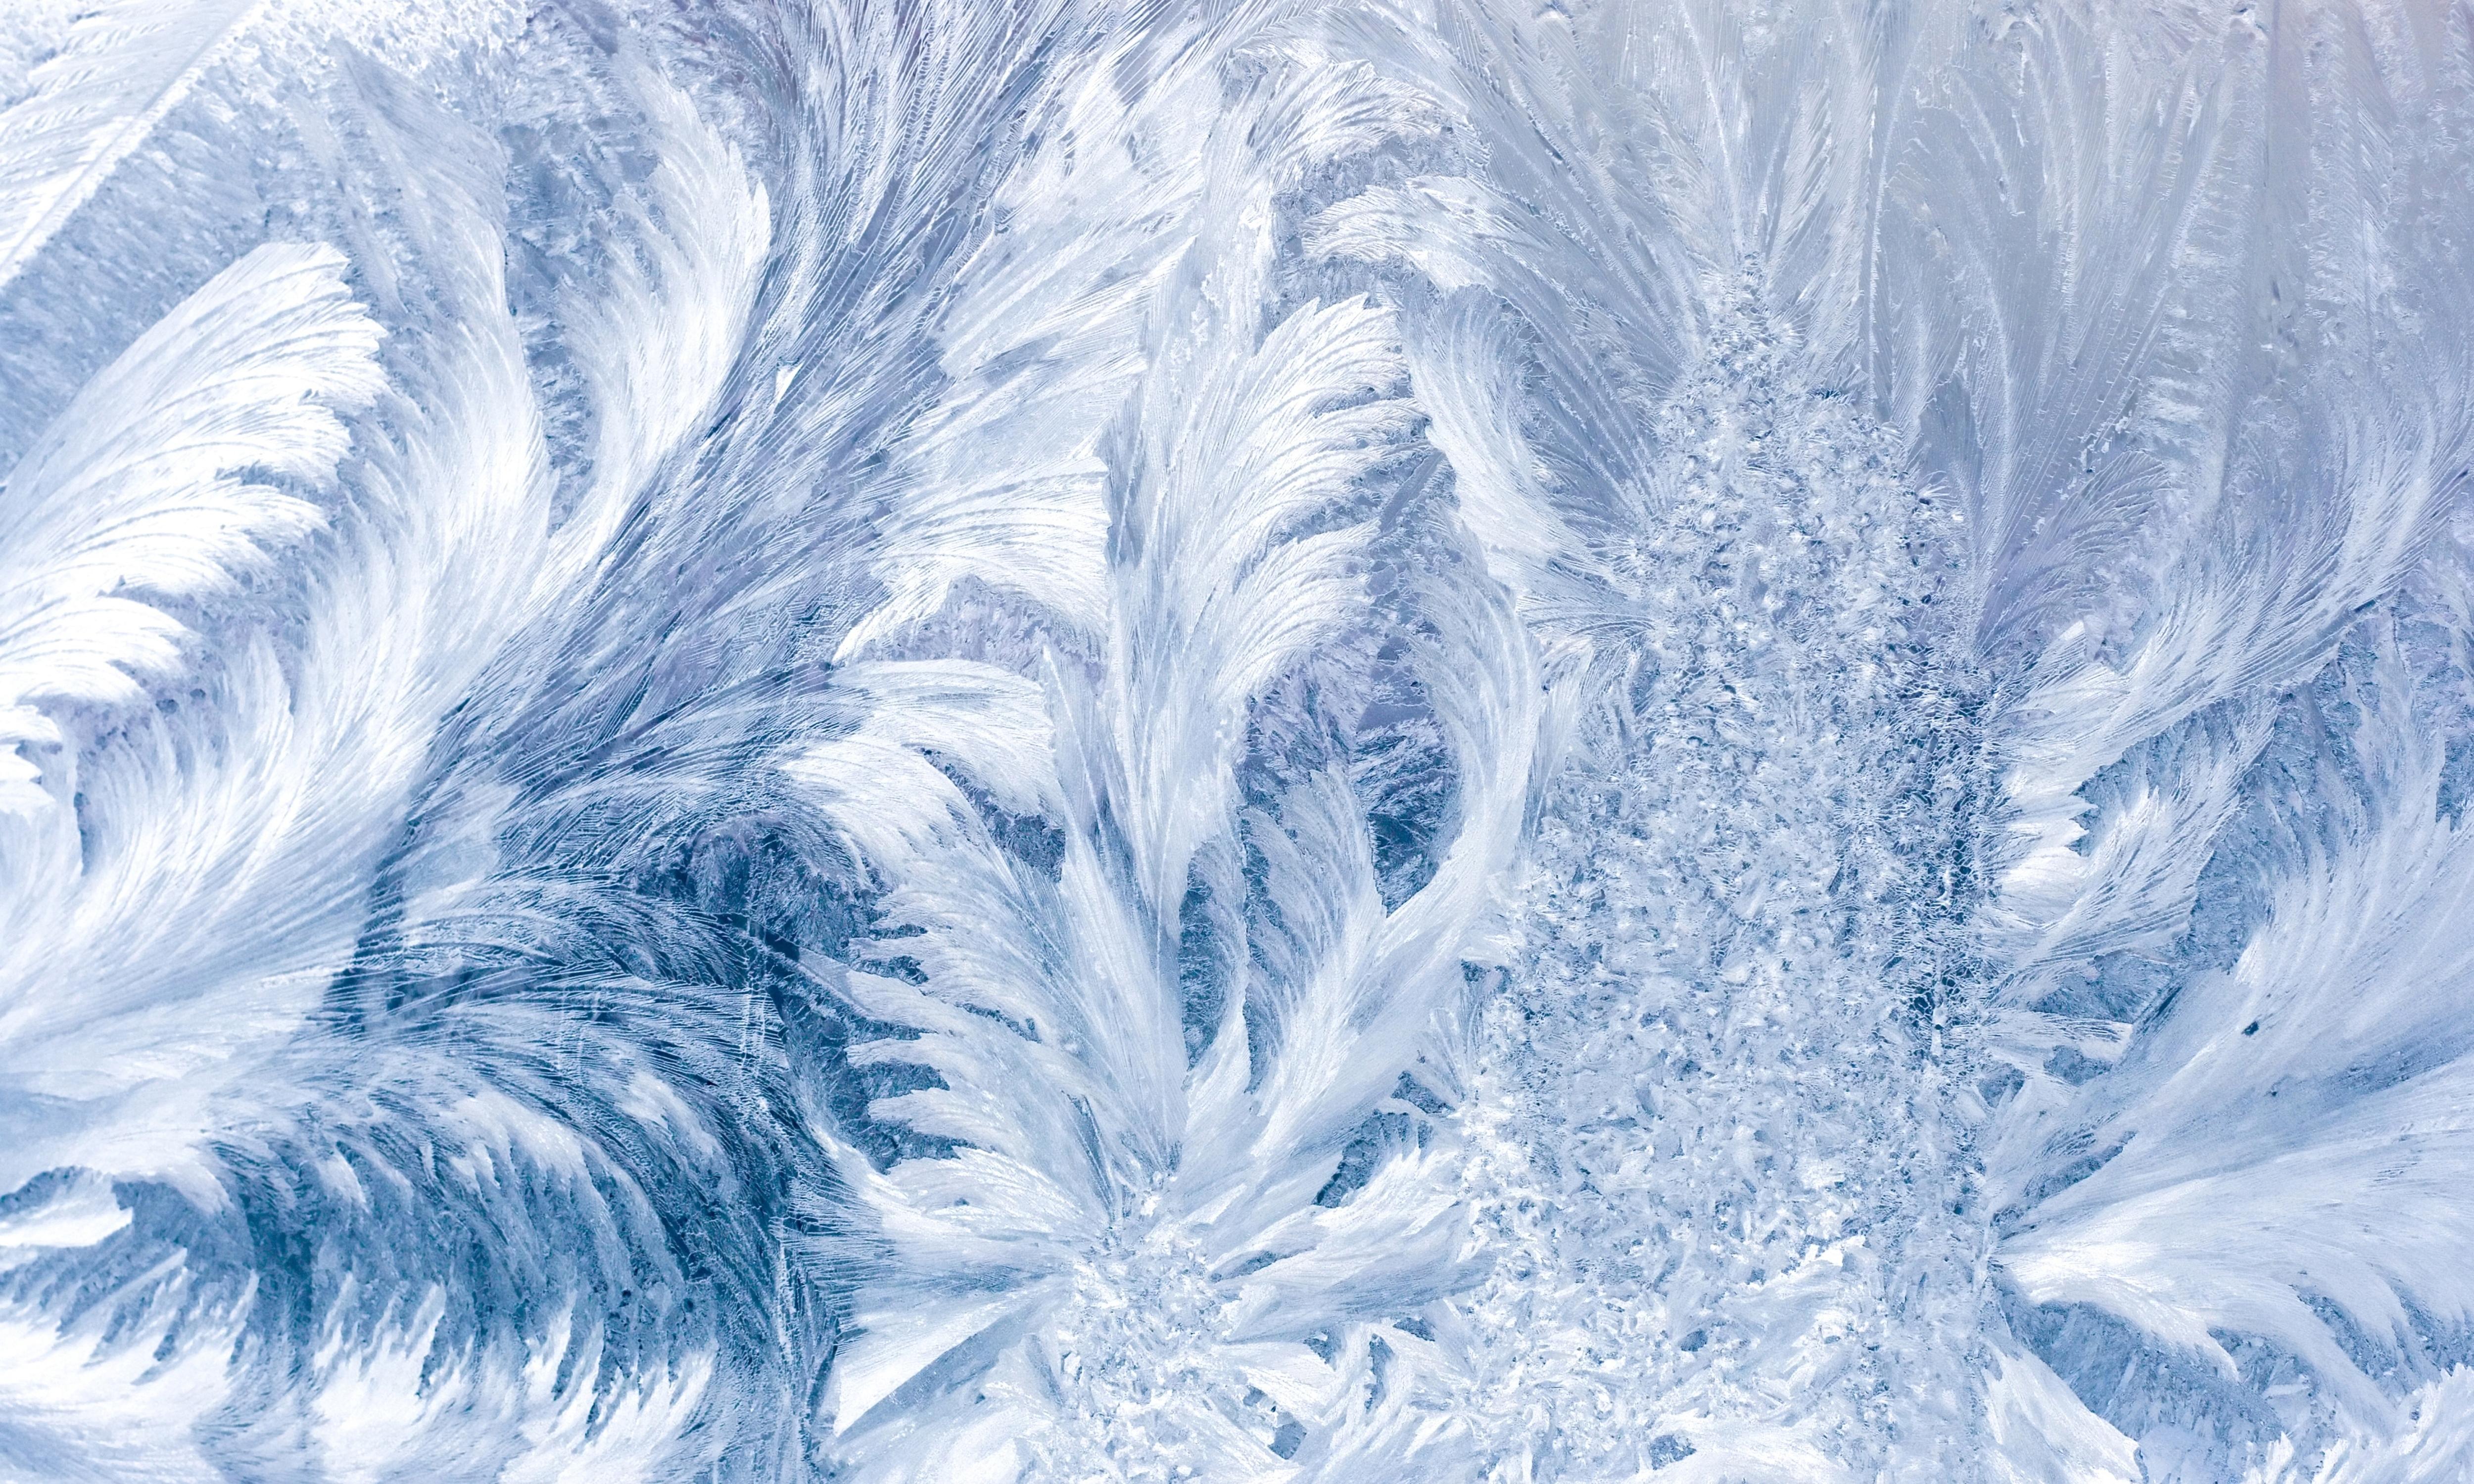 Pattern frost glass frost winter wallpaper   ForWallpapercom 5000x3000